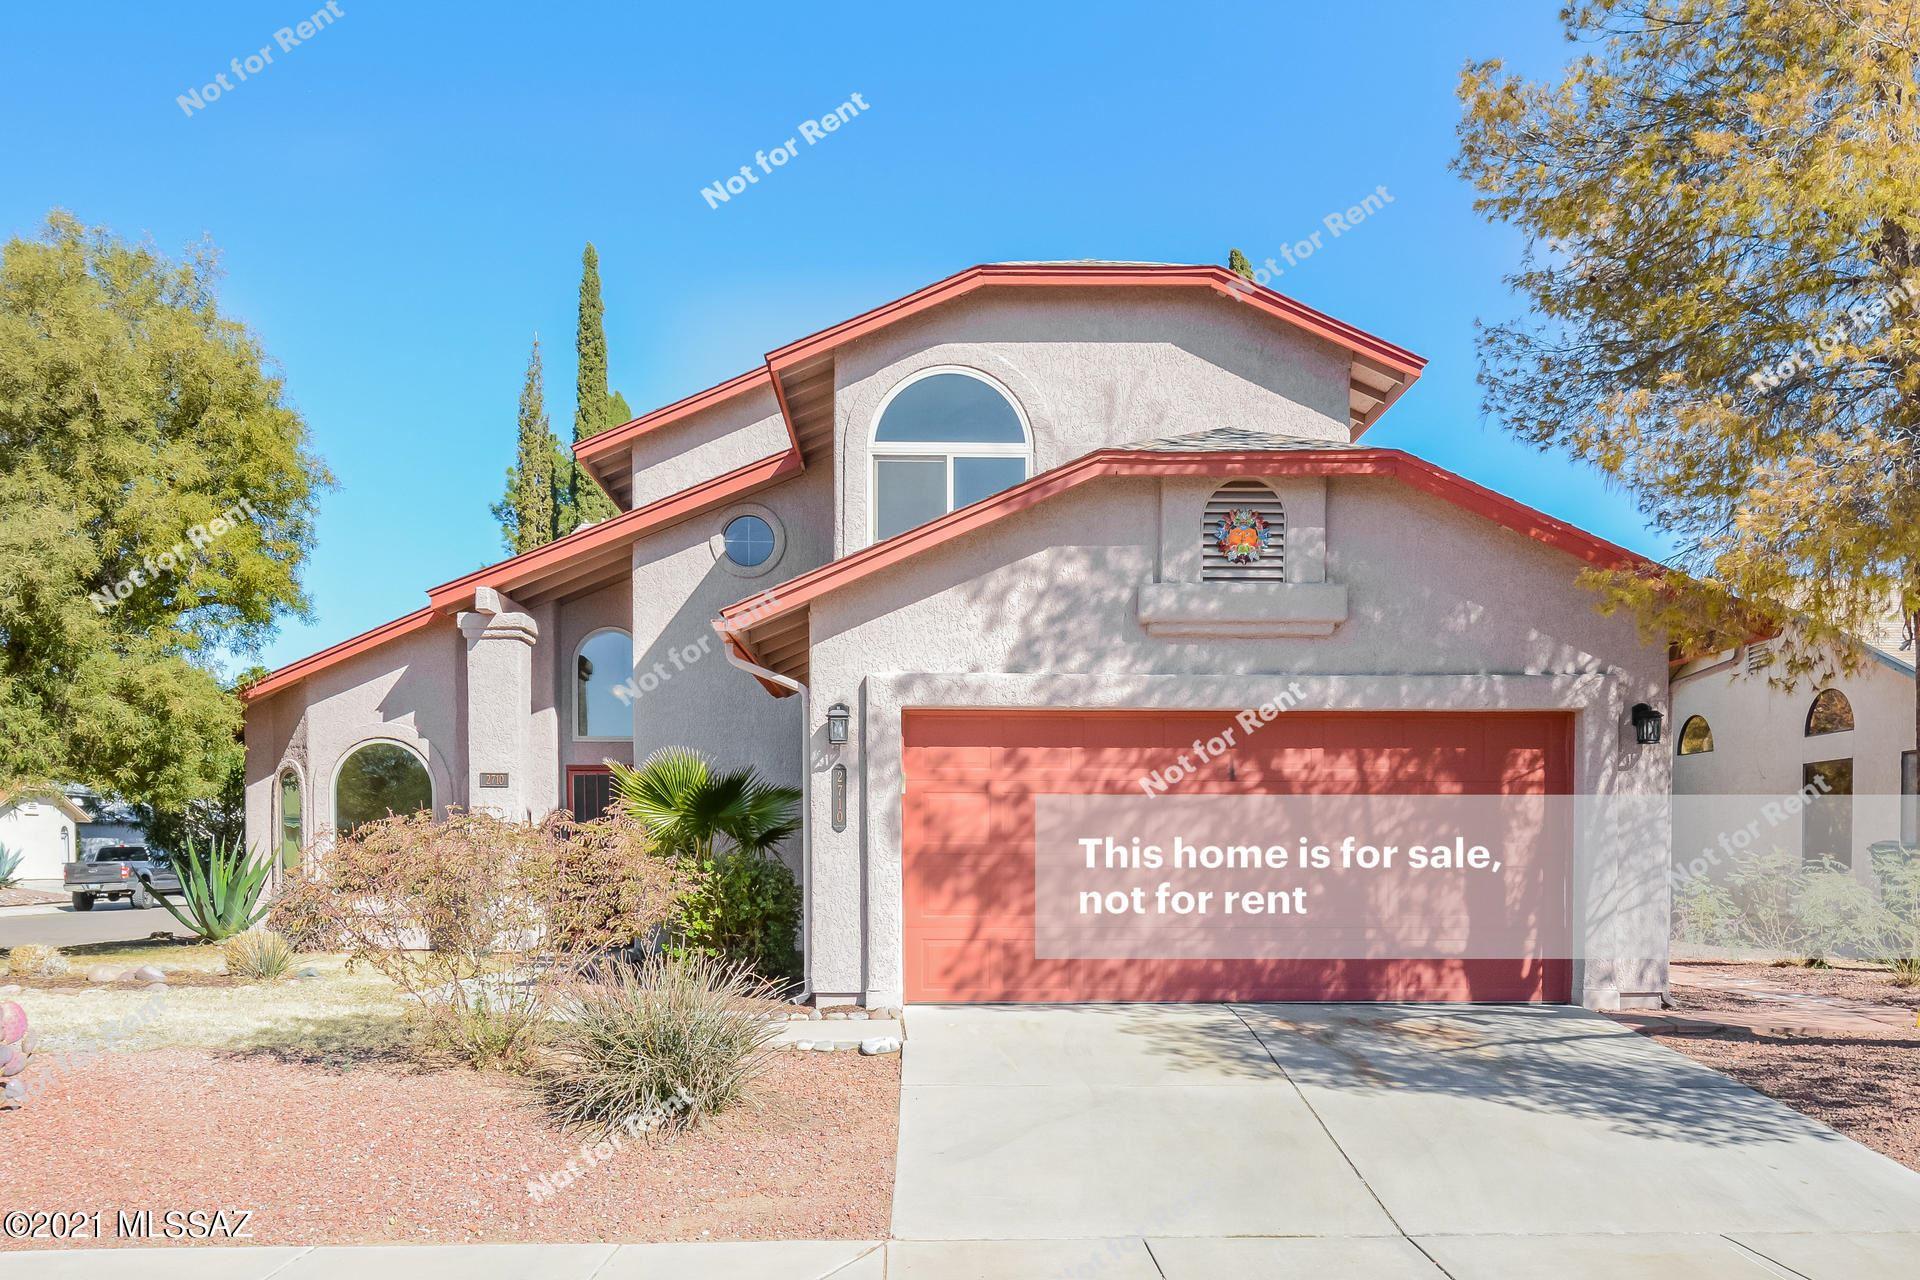 2710 W Camino Del Medrano, Tucson, AZ 85742 - MLS#: 22104961